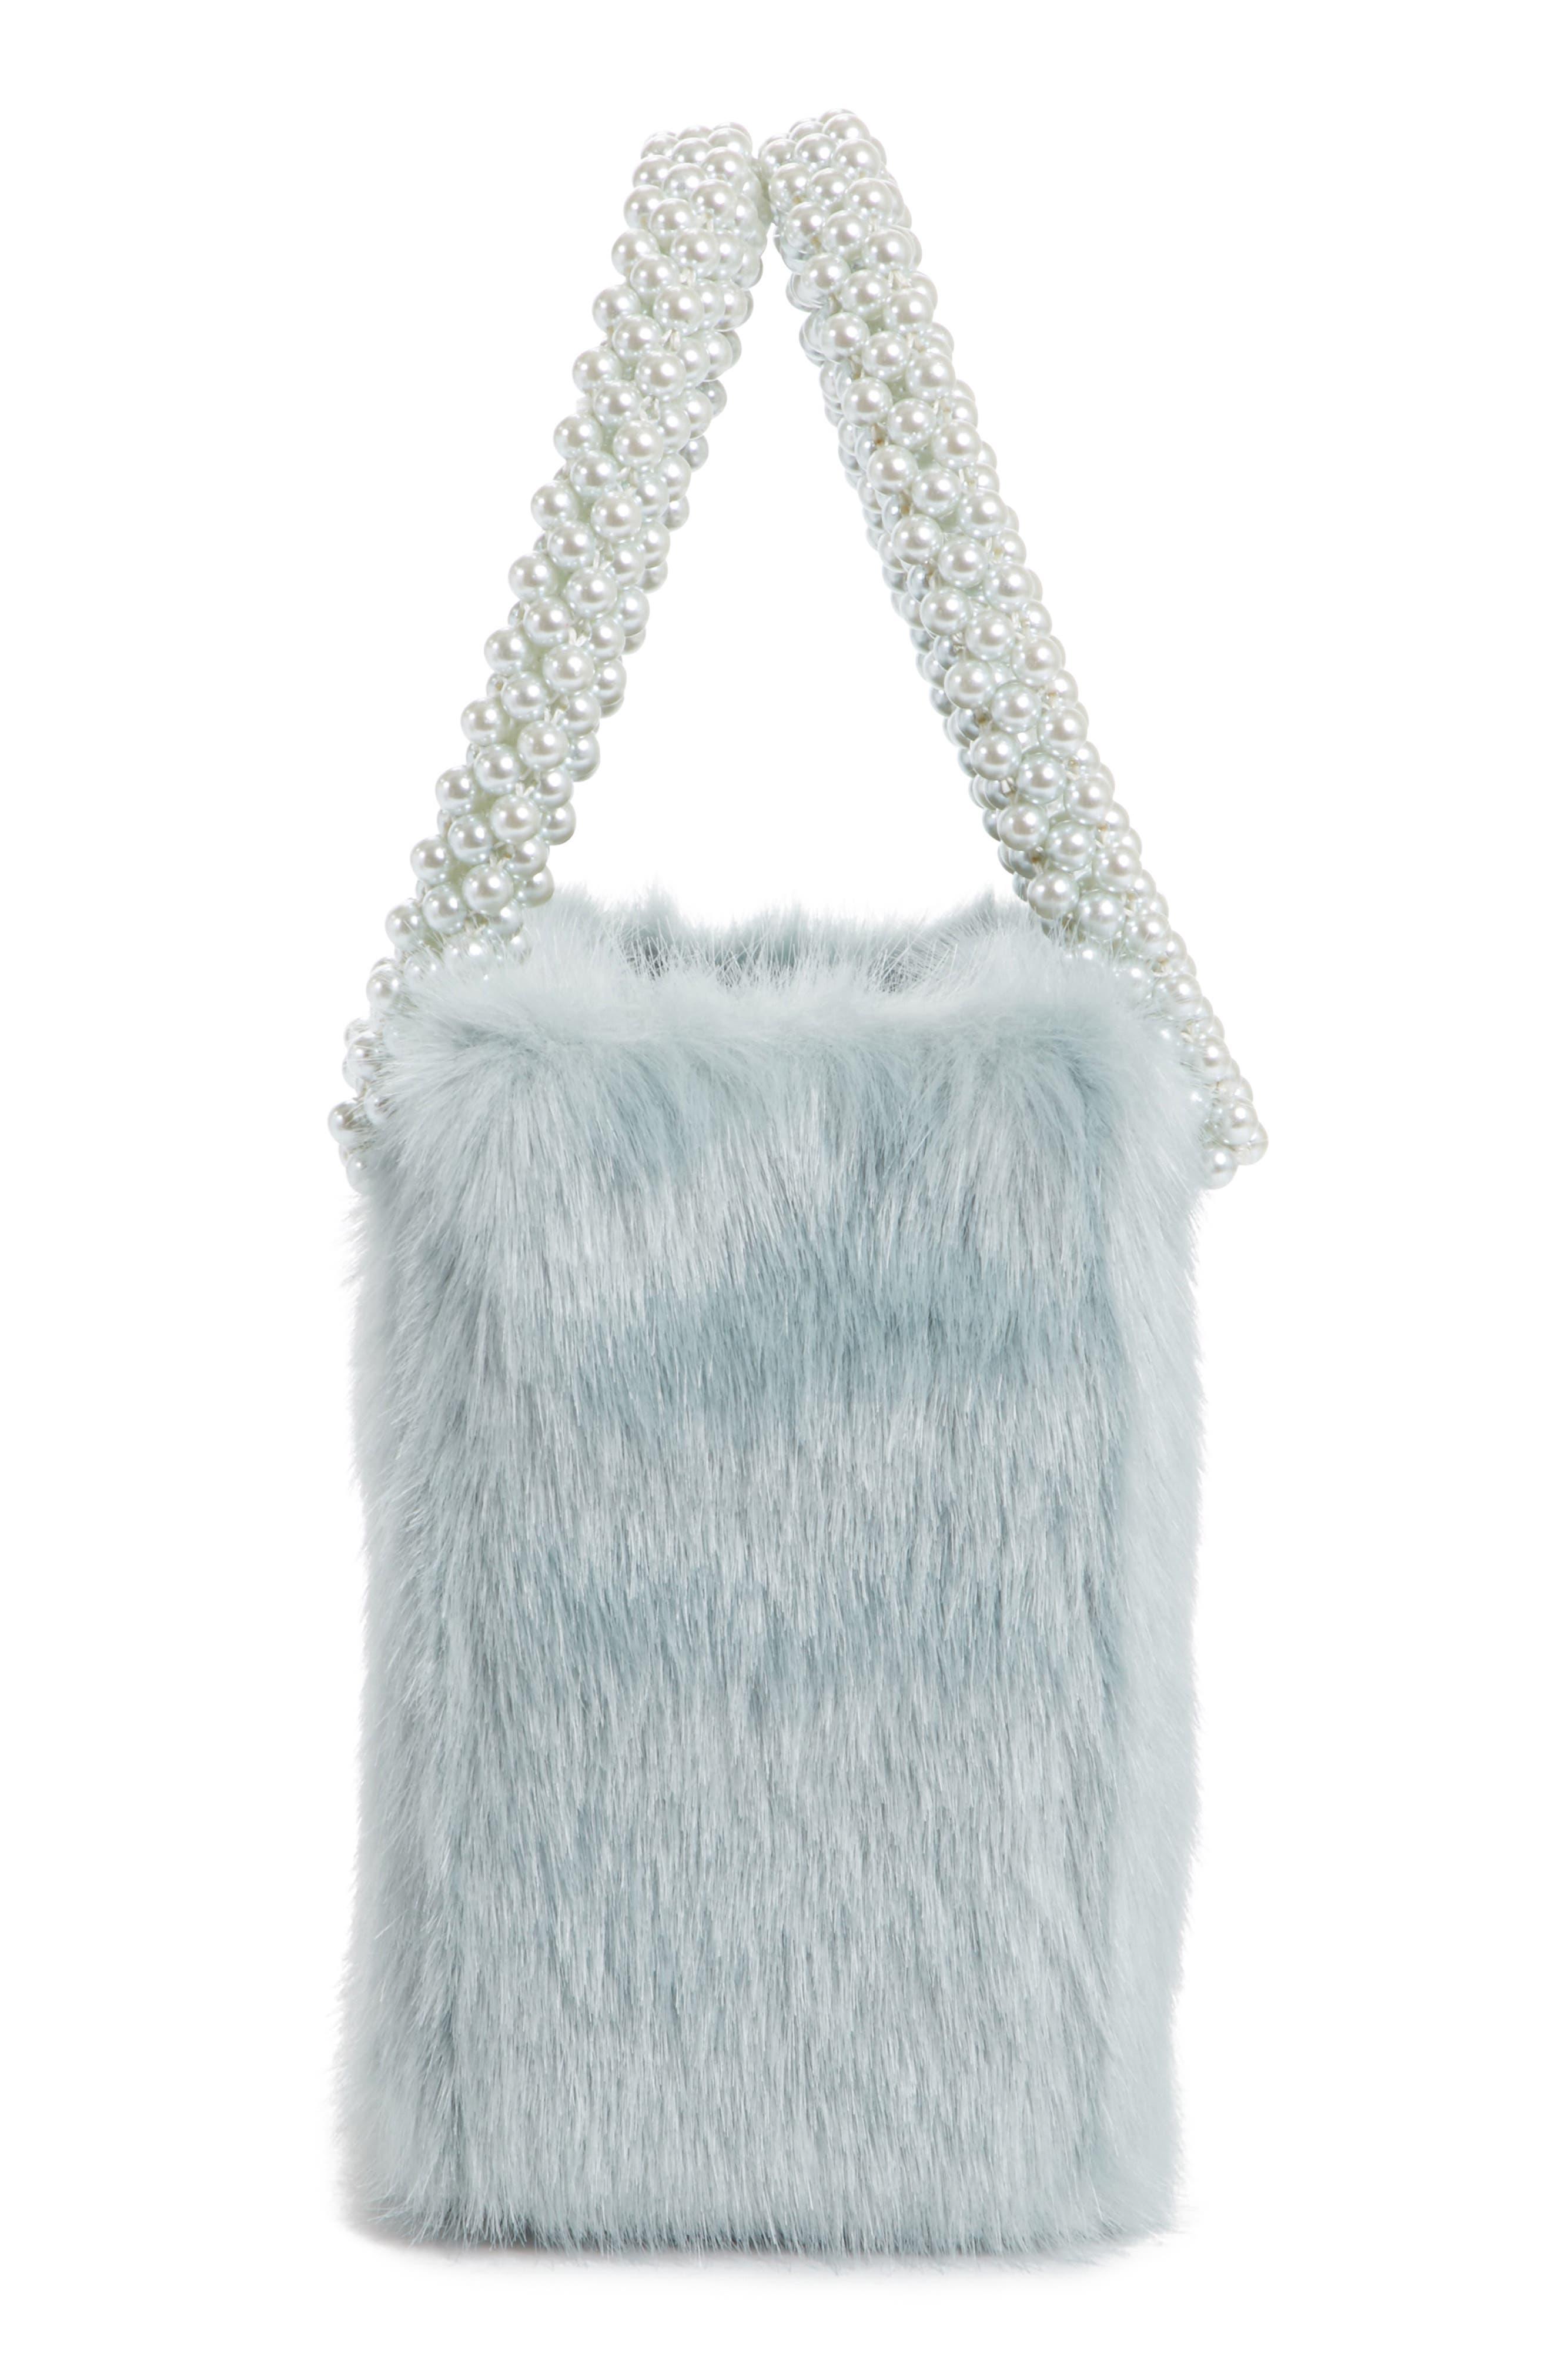 Una Check Faux Fur Bag with Imitation Pearl Handles,                             Alternate thumbnail 5, color,                             440